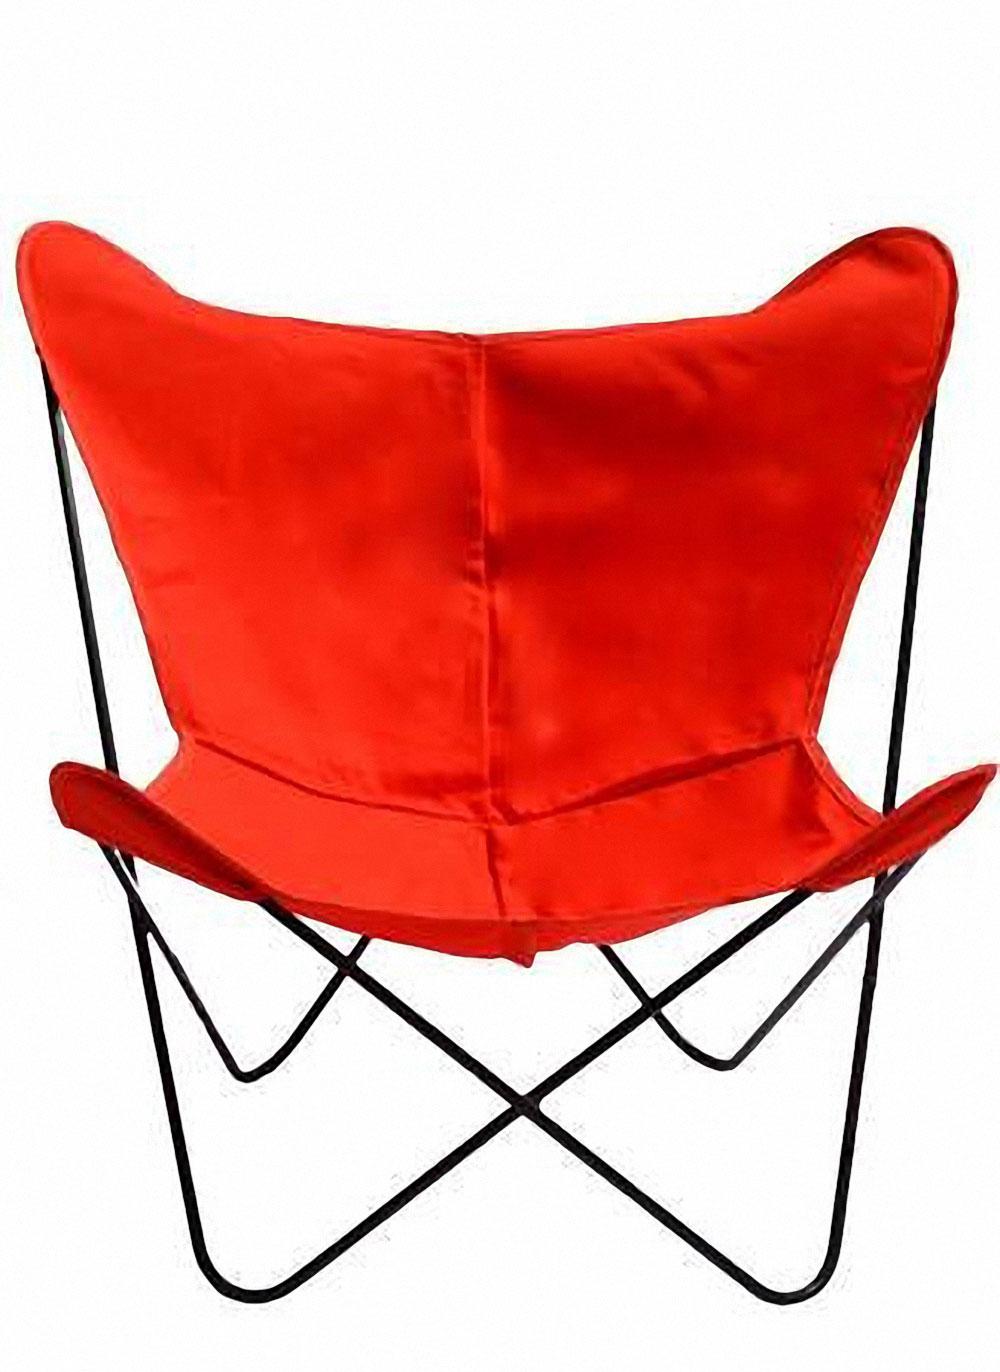 jestcafe.com--flutterfly-chairs